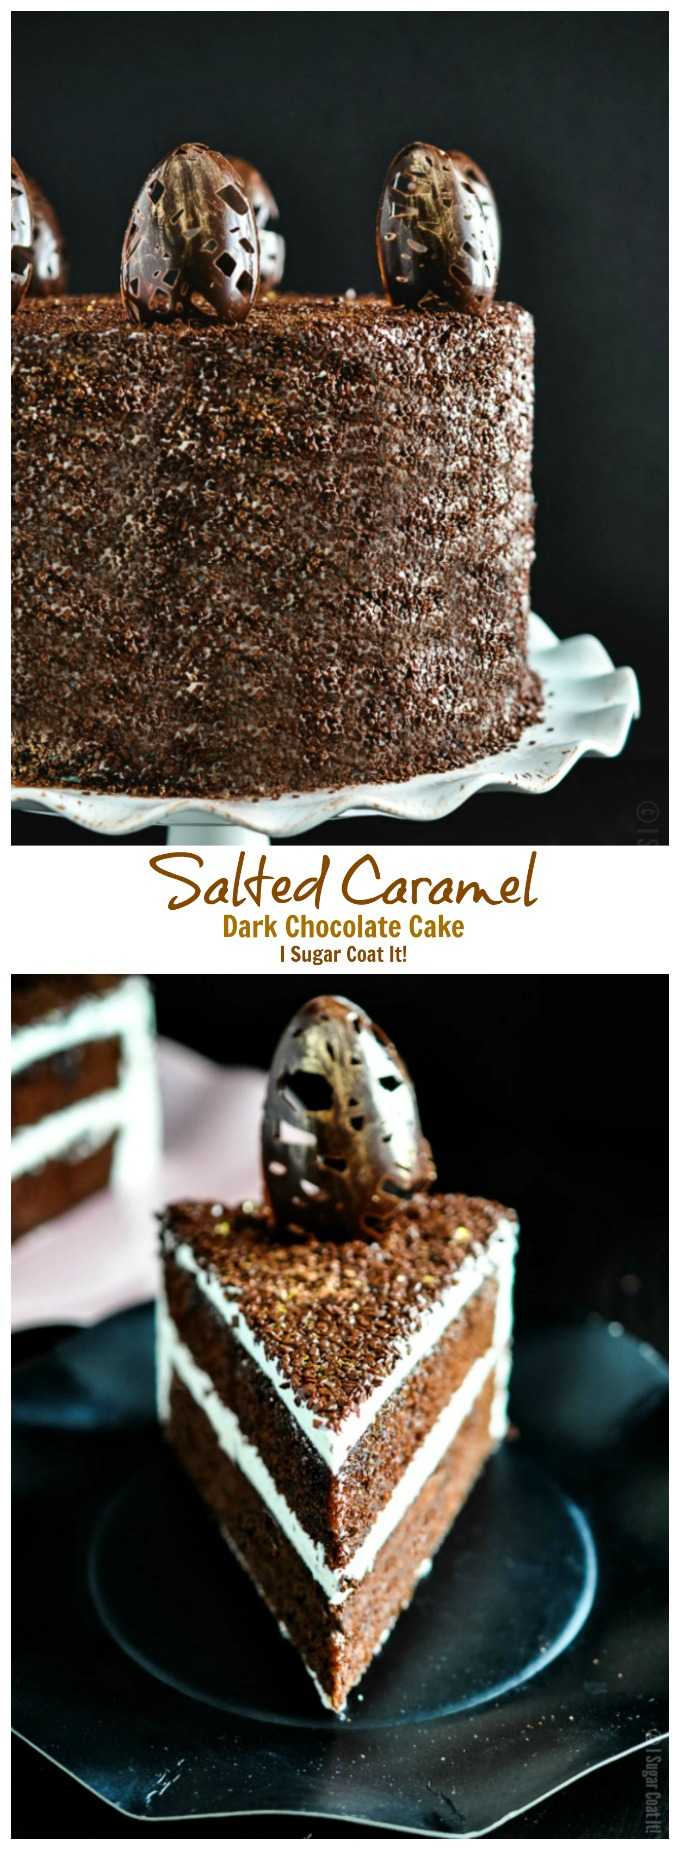 Salted Caramel Dark Chocolate Cake - I Sugar Coat It